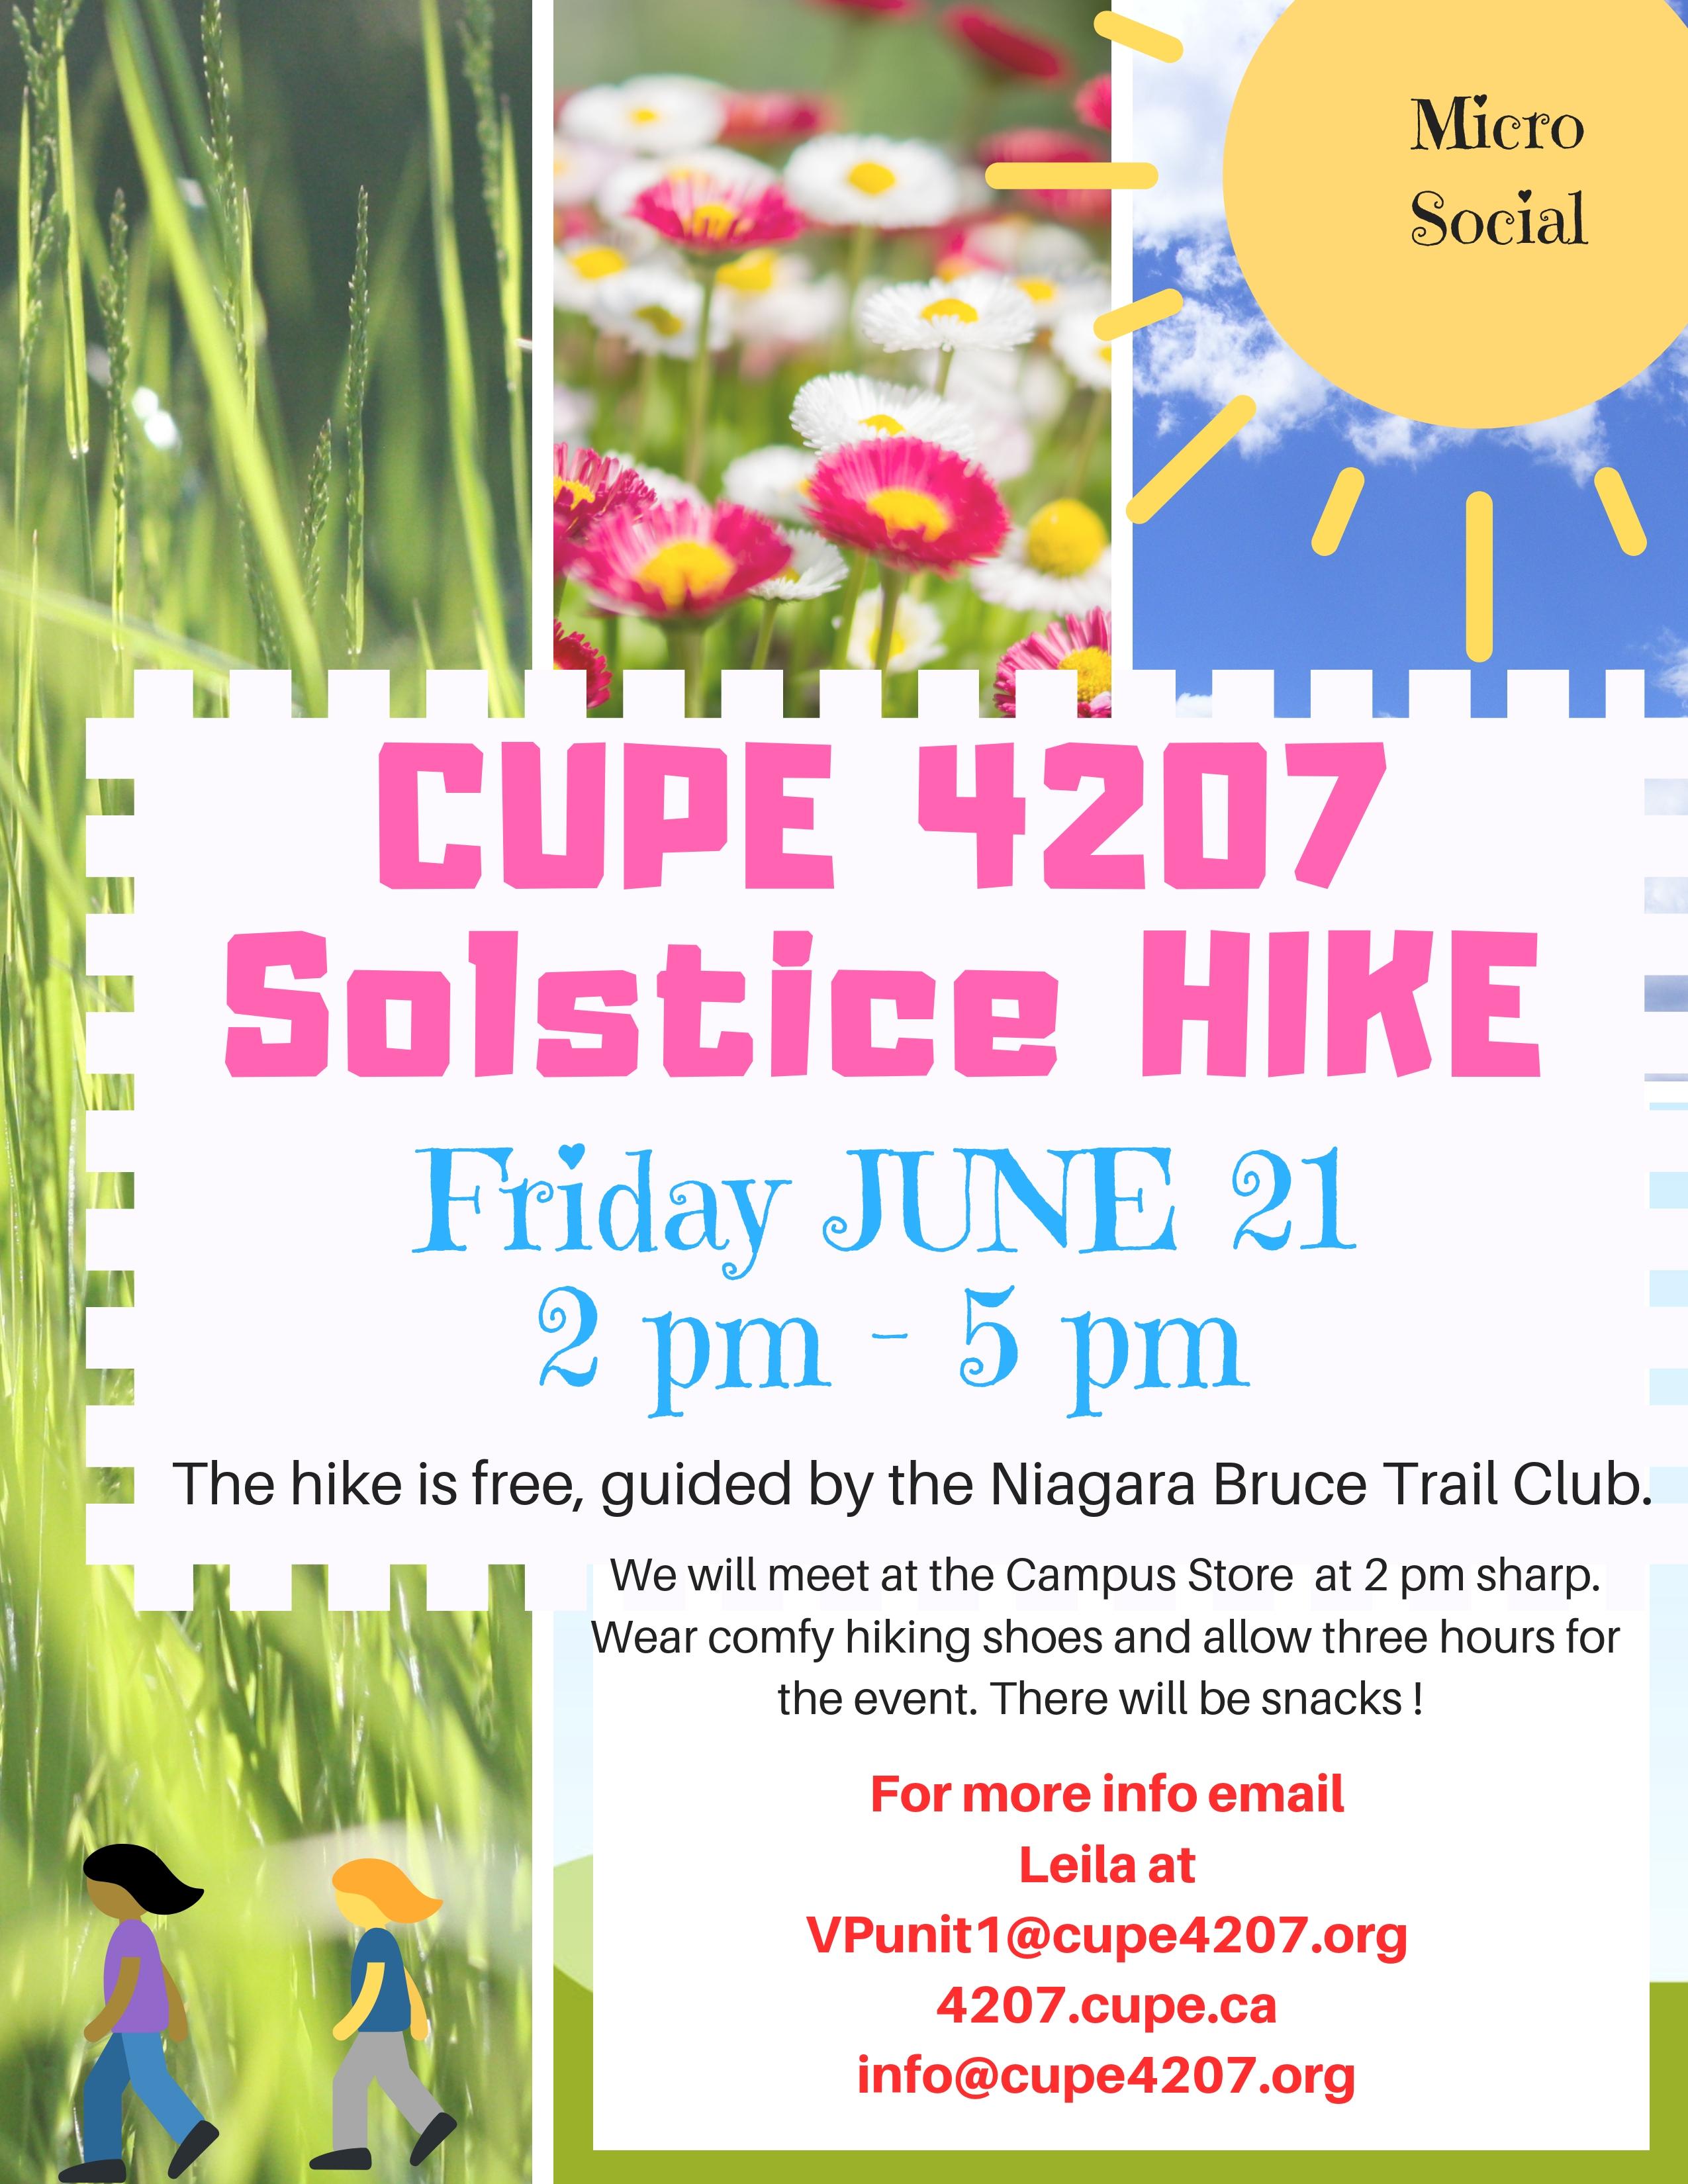 Summer Solstice Hike - MicroSocial